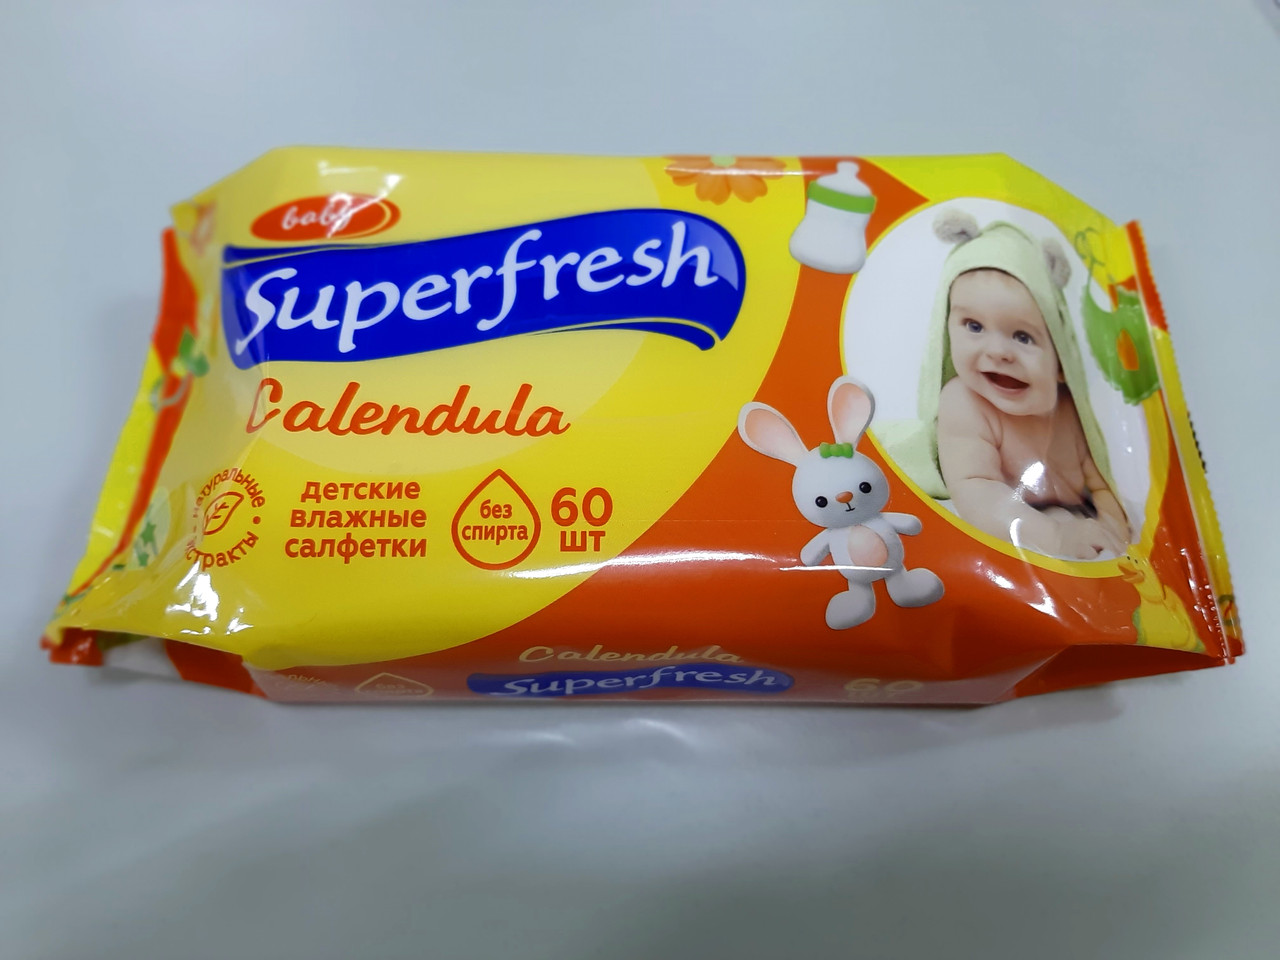 Салфетка влажная Superfresh 60 шт Календула